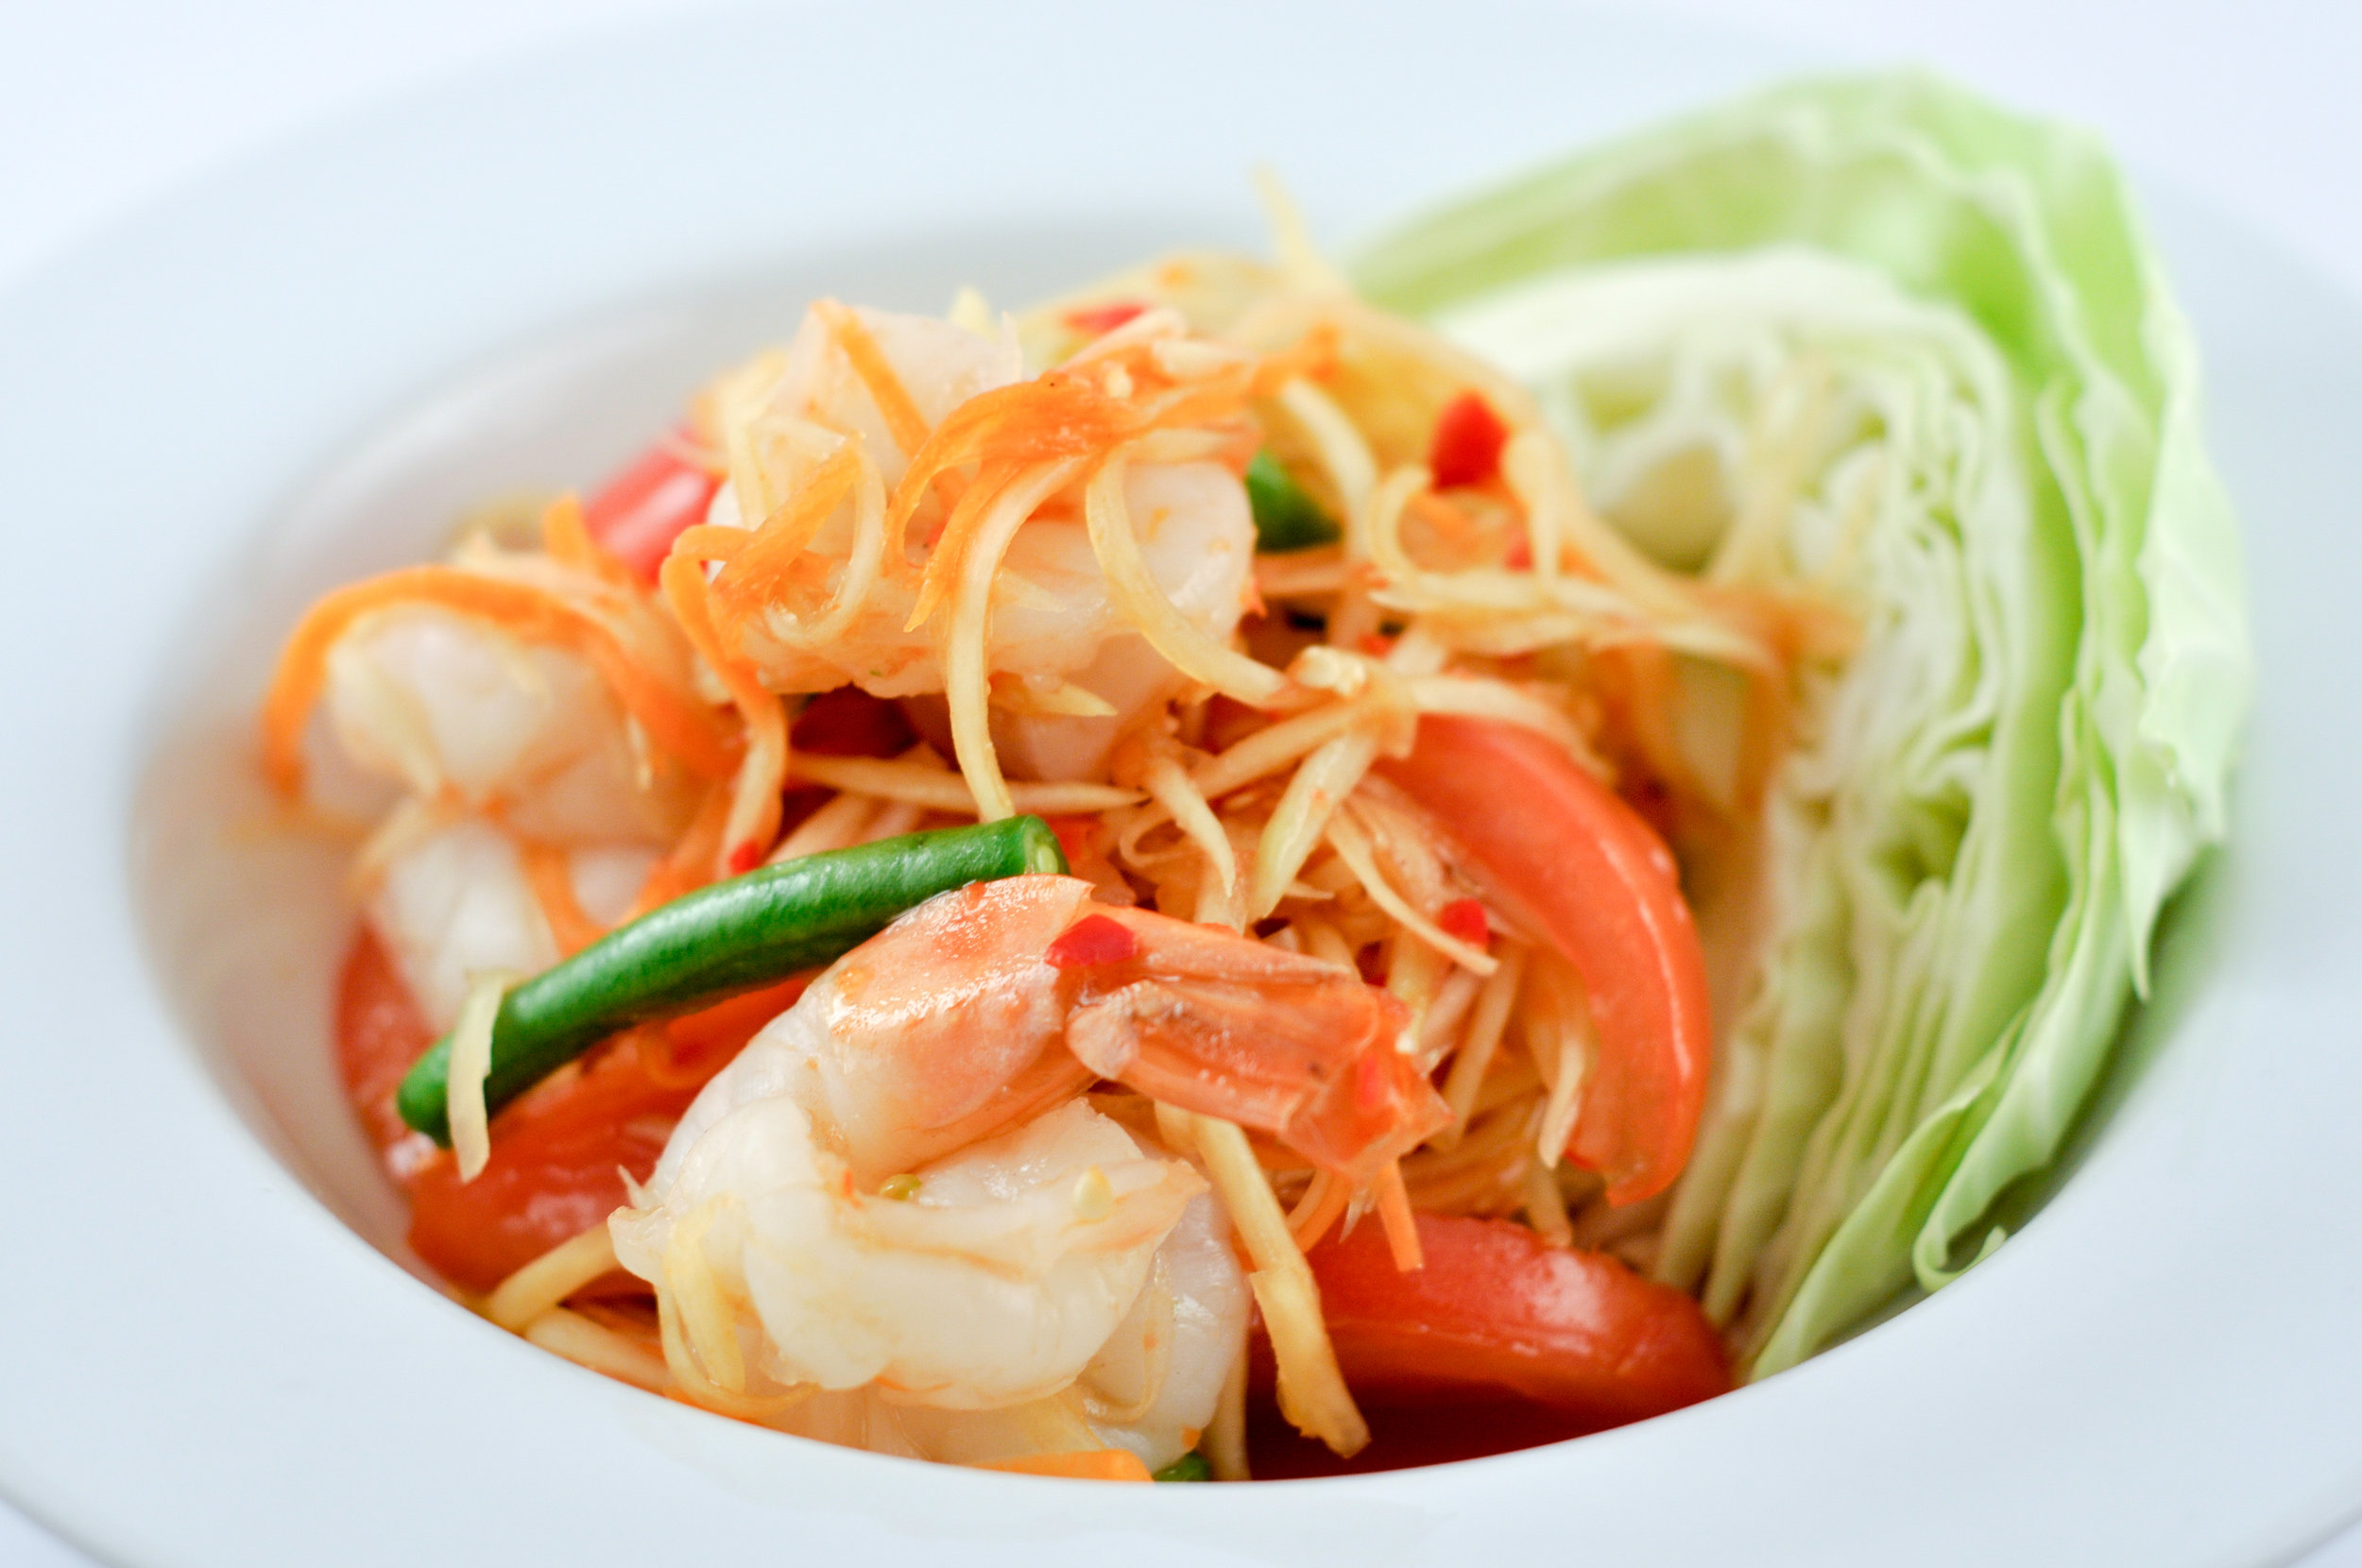 Tum Koong – Papaya Salad with Prawns